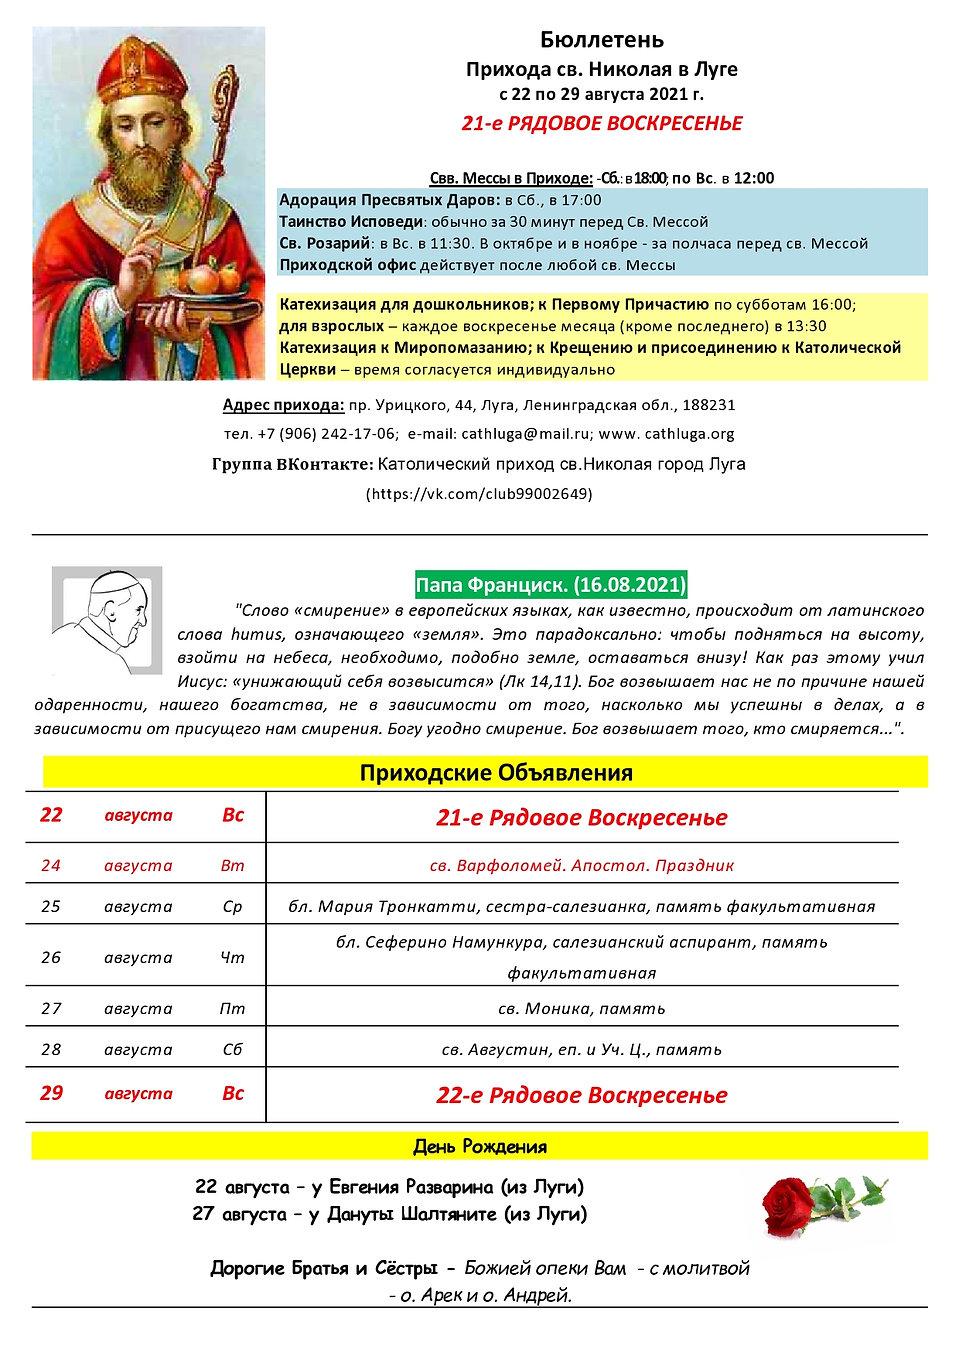 Л 20210822-29 21 РВс ОБЪЯВЛЕНИЯ-page0001.jpg